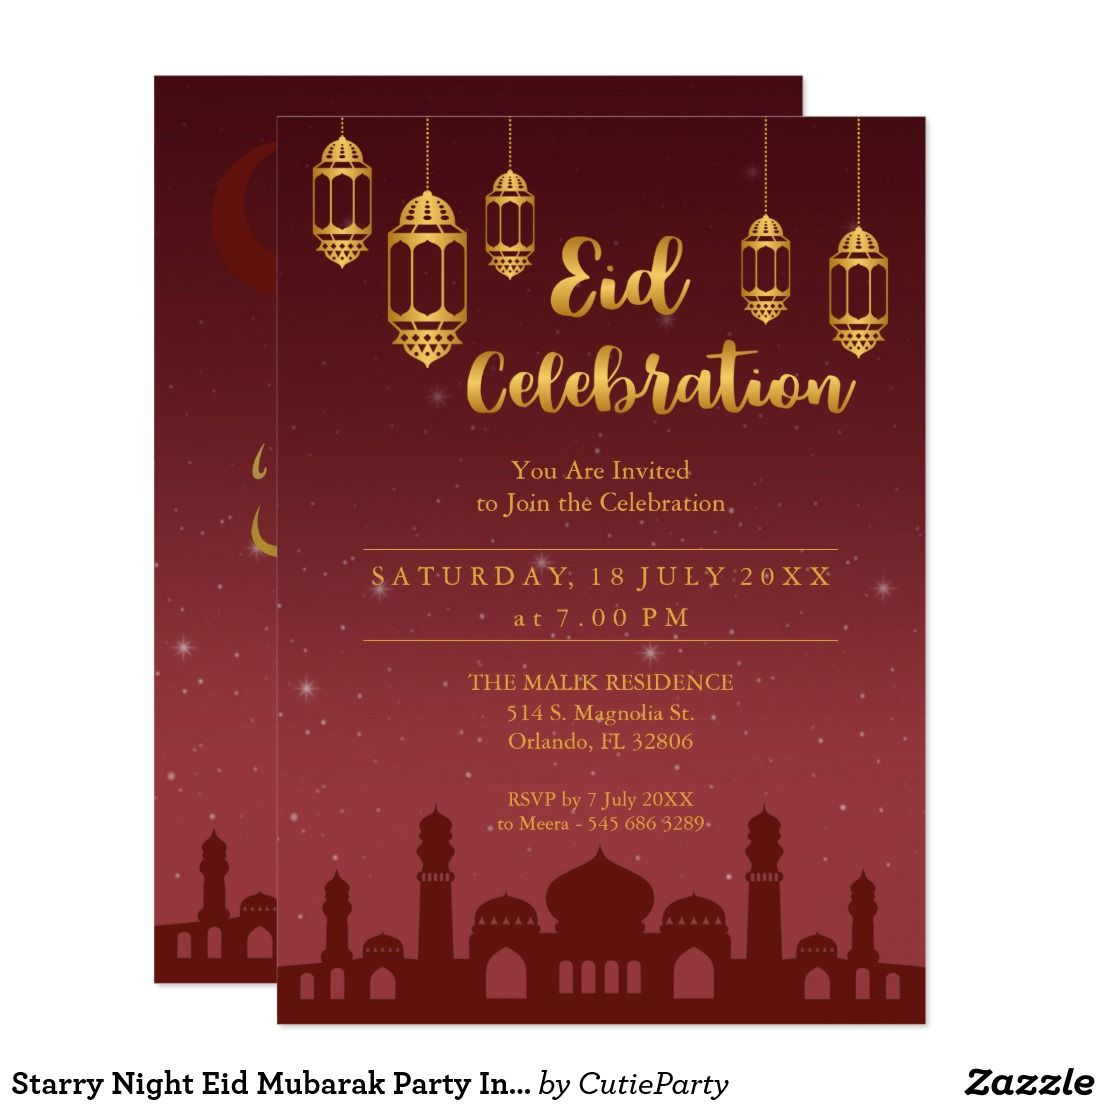 starry night eid mubarak party invitation  zazzle